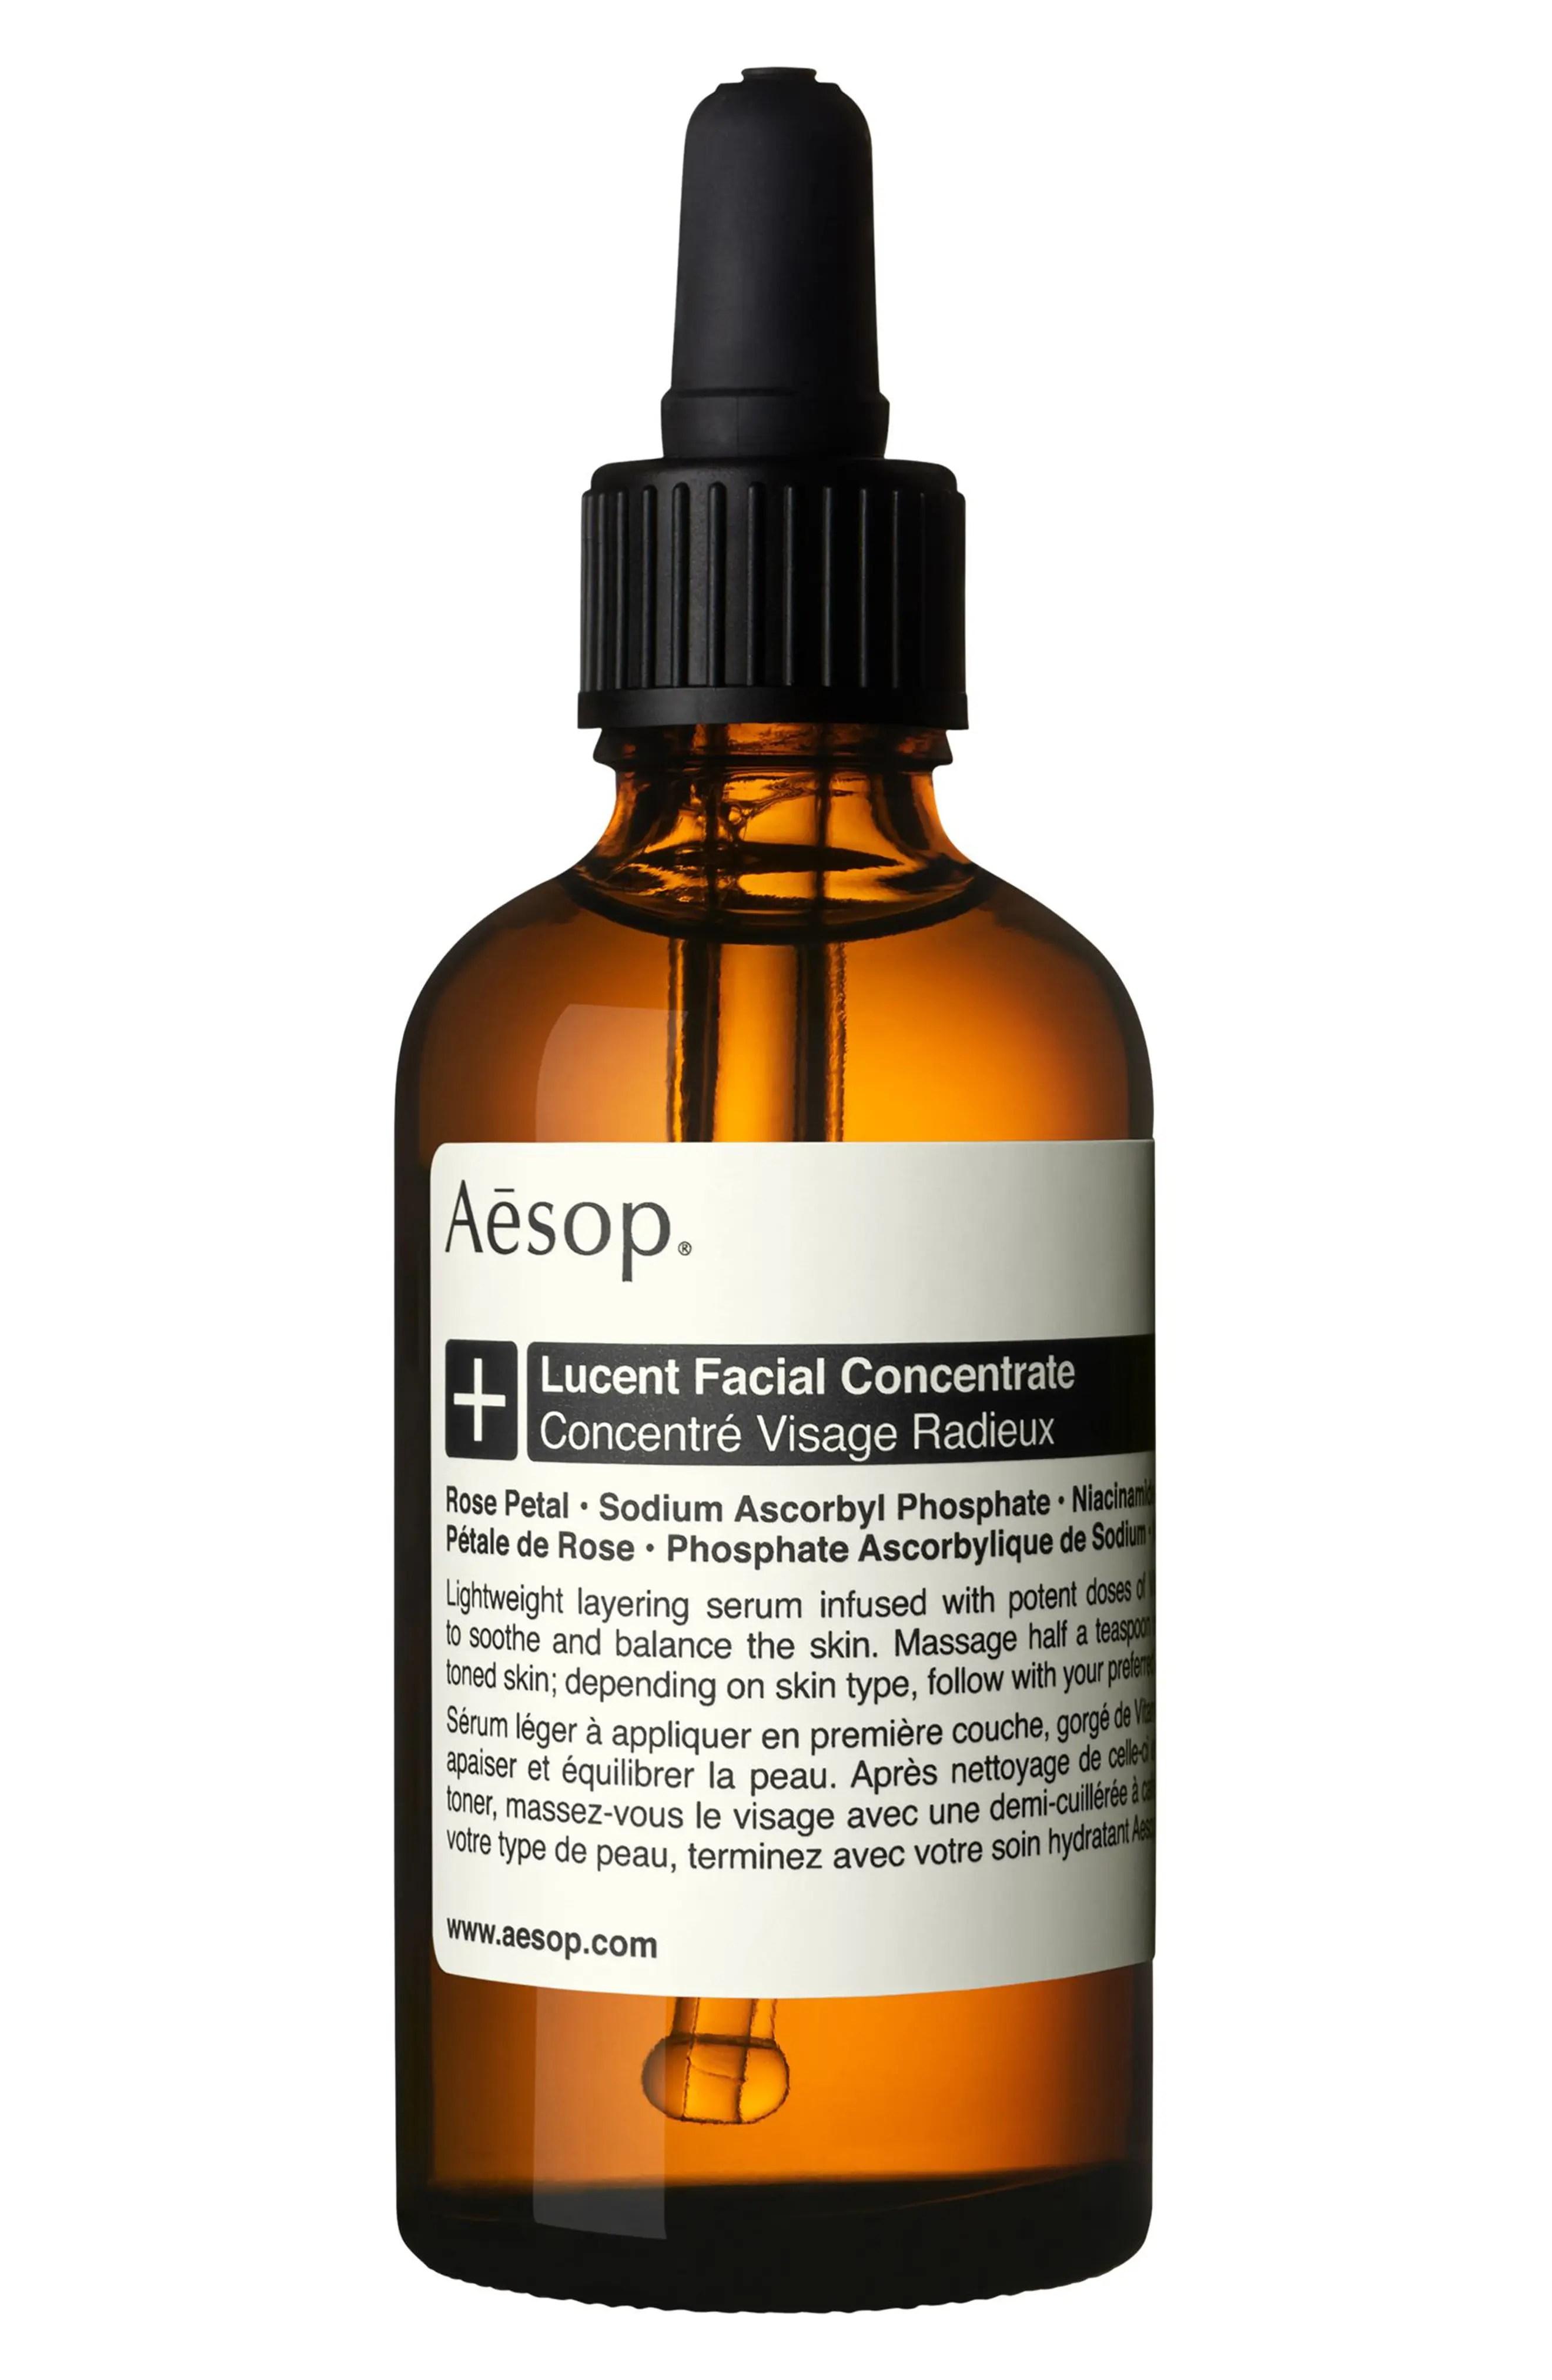 AESOP Lucent Facial Concentrate, Main, color, NO COLOR